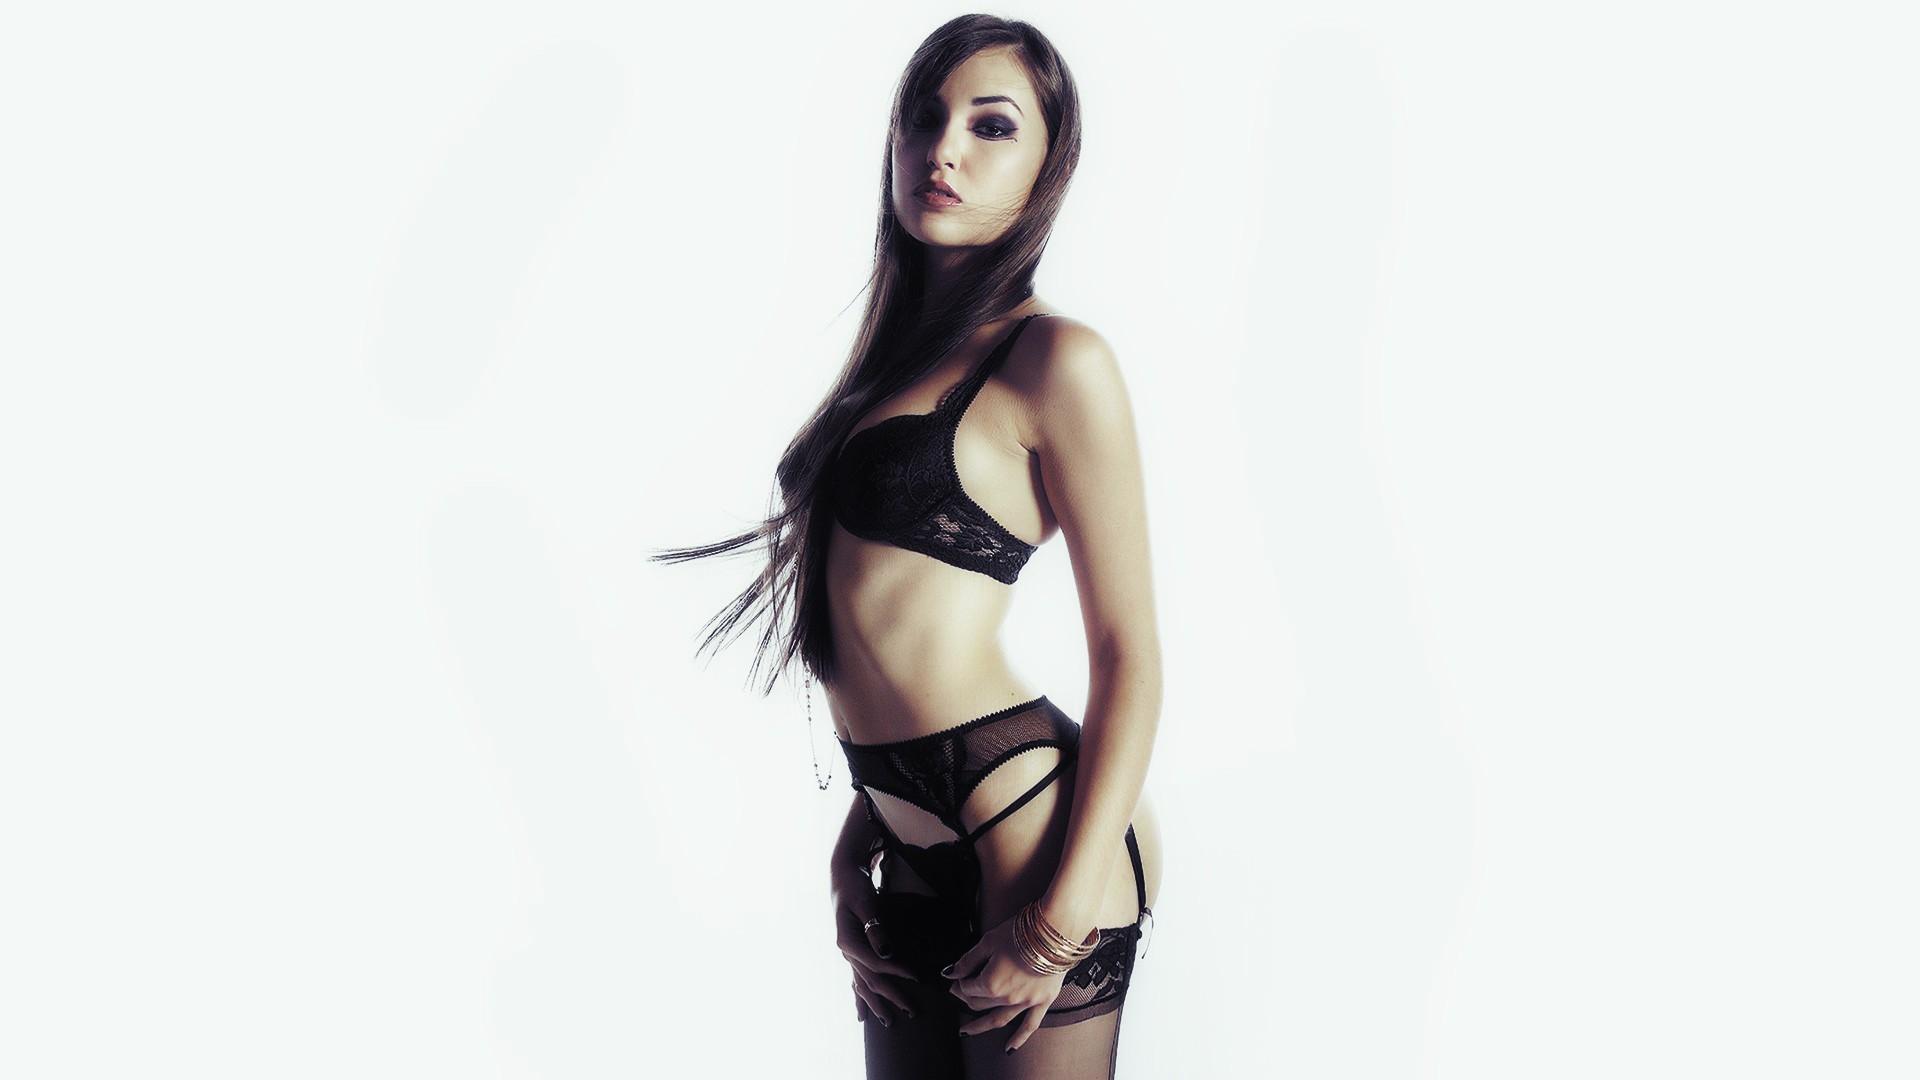 Fondos De Pantalla Sasha Grey Pornstar 1920x1080